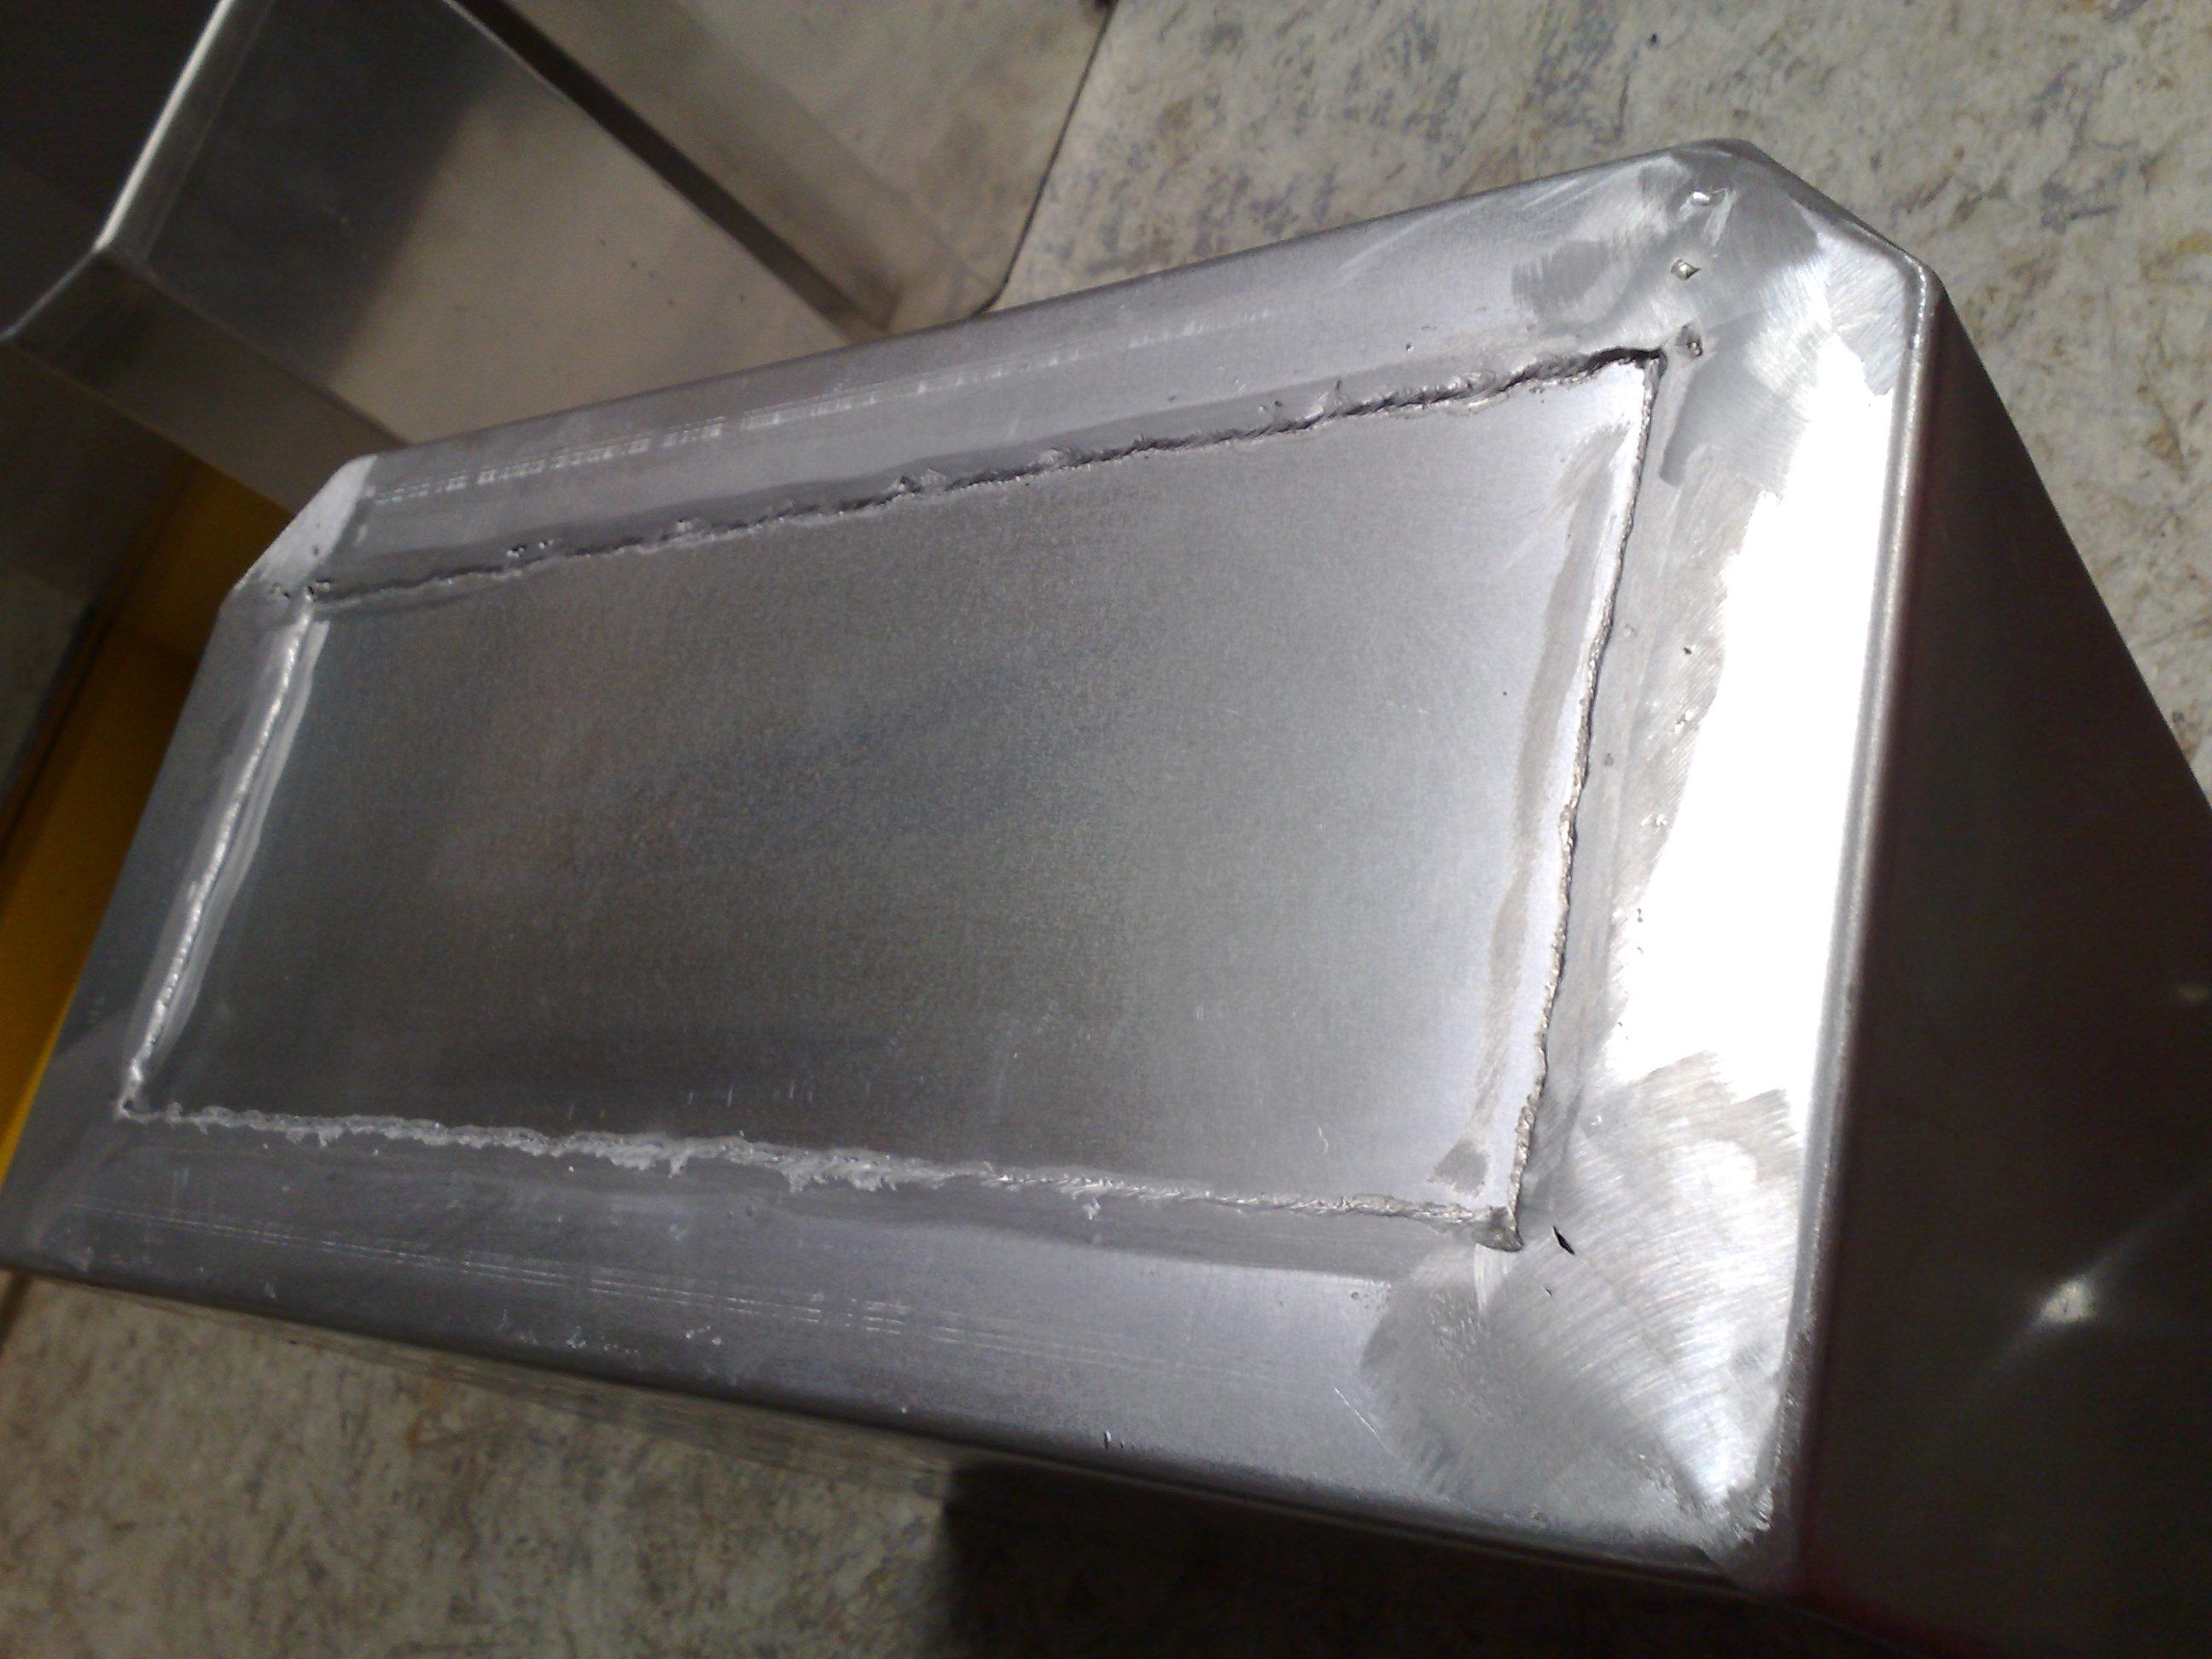 Spawarka do blachy aluminiowej 2mm 1050A